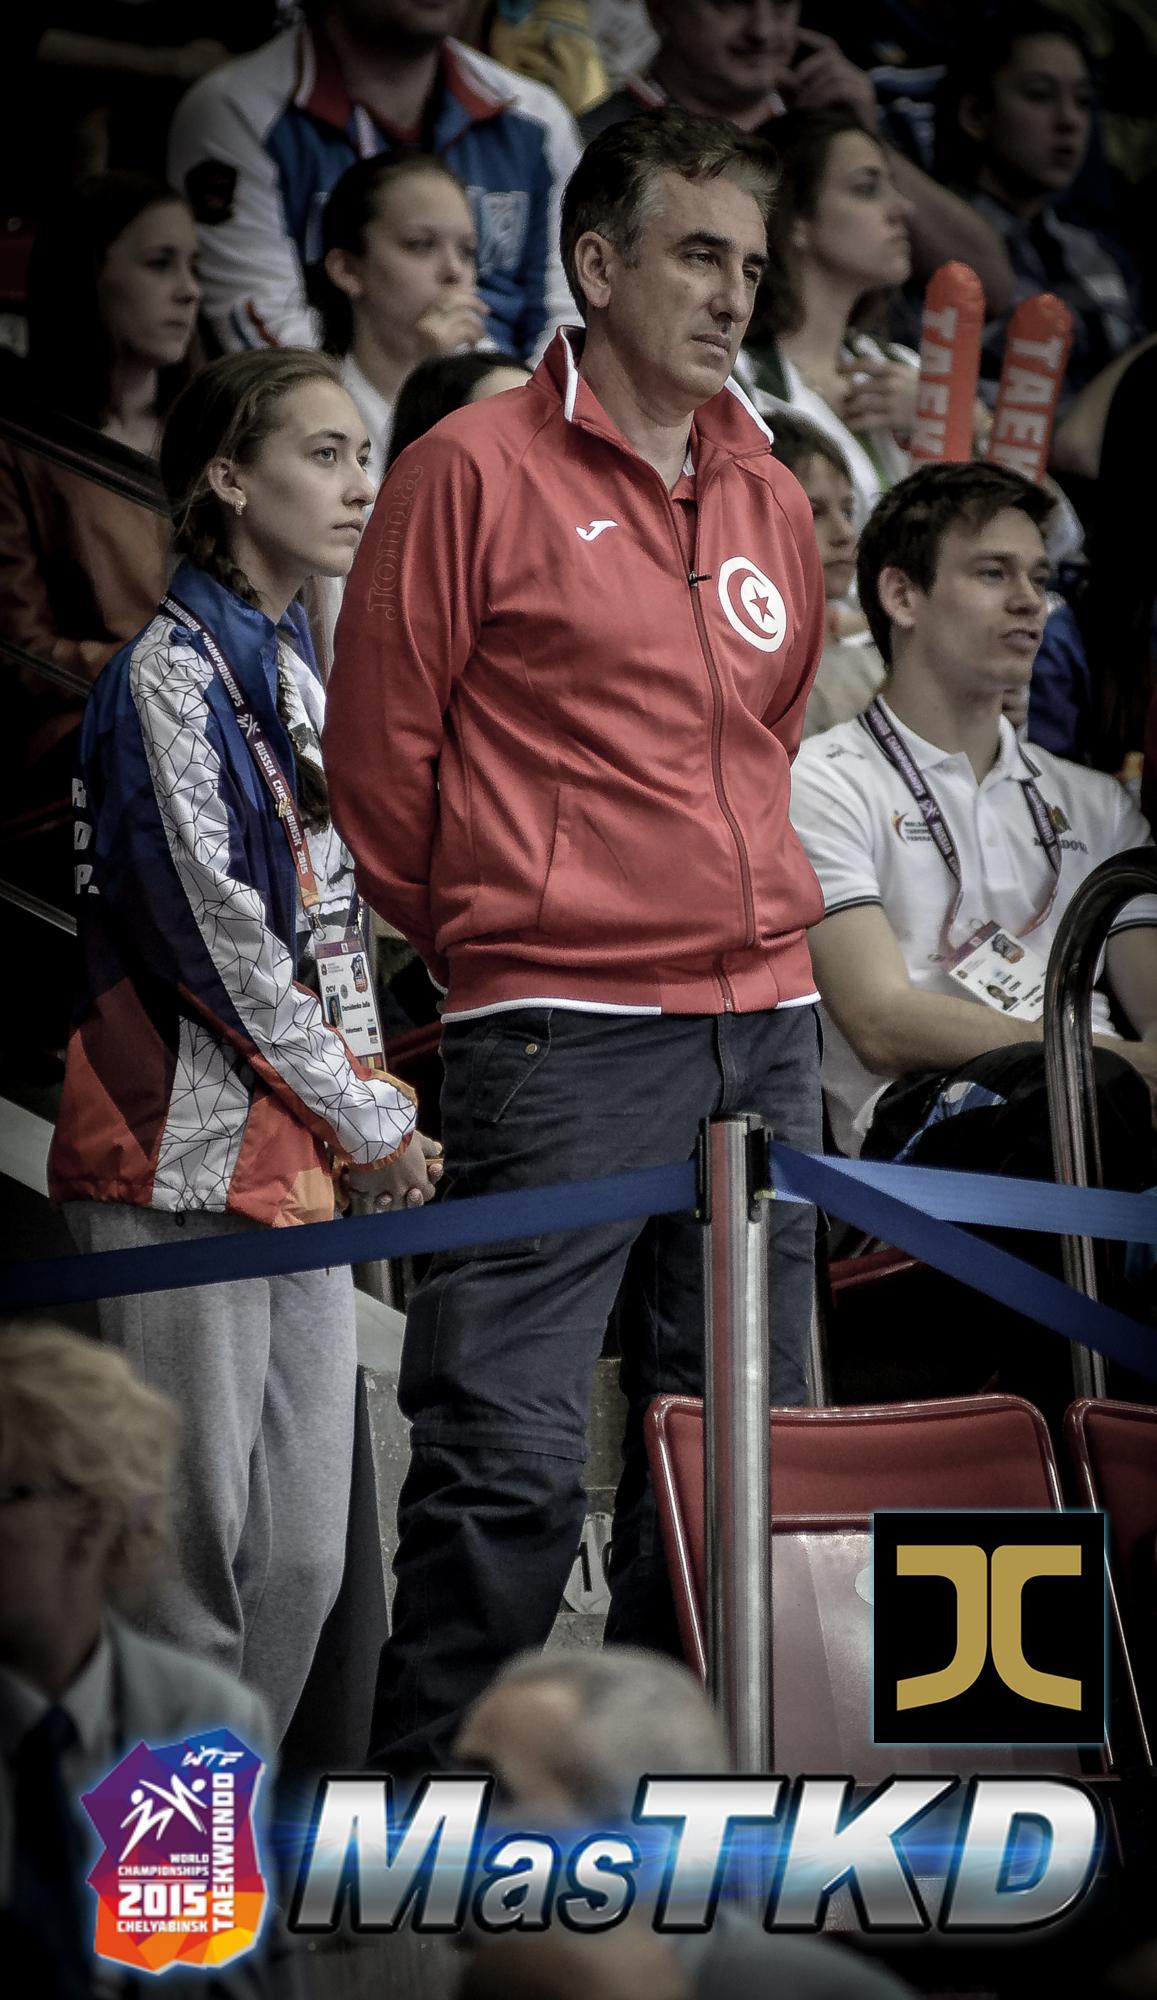 11_JCalicu-Mundial-Taekwondo-Mejores-Imagenes